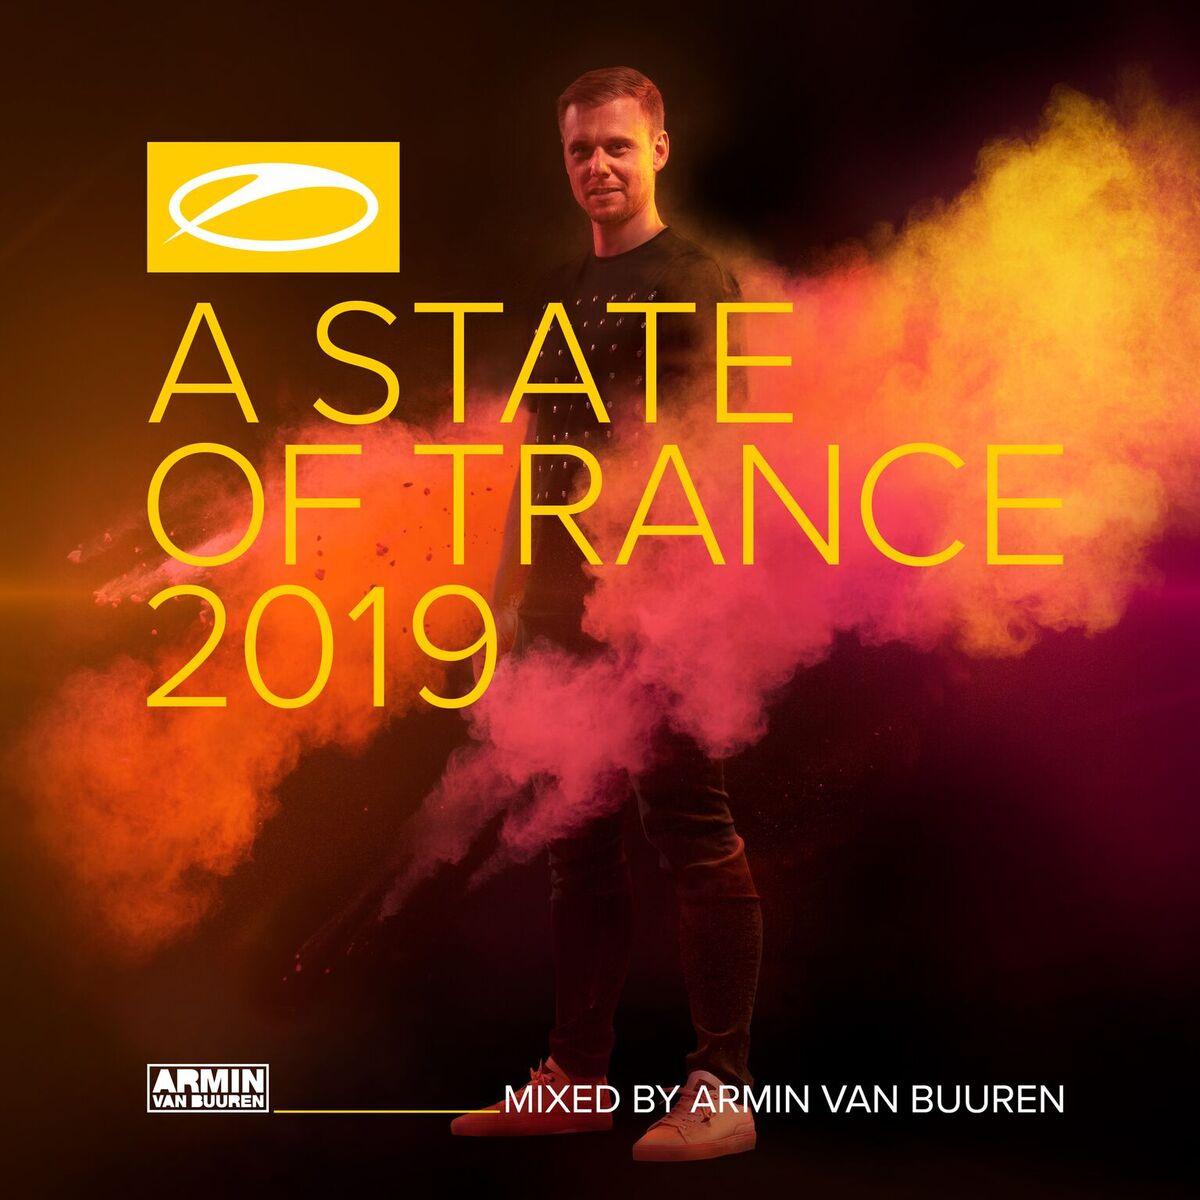 ARMIN VAN BUUREN REACHES NEW HEIGHTS WITH 'A STATE OF TRANCE 2019' ALBUM ile ilgili görsel sonucu